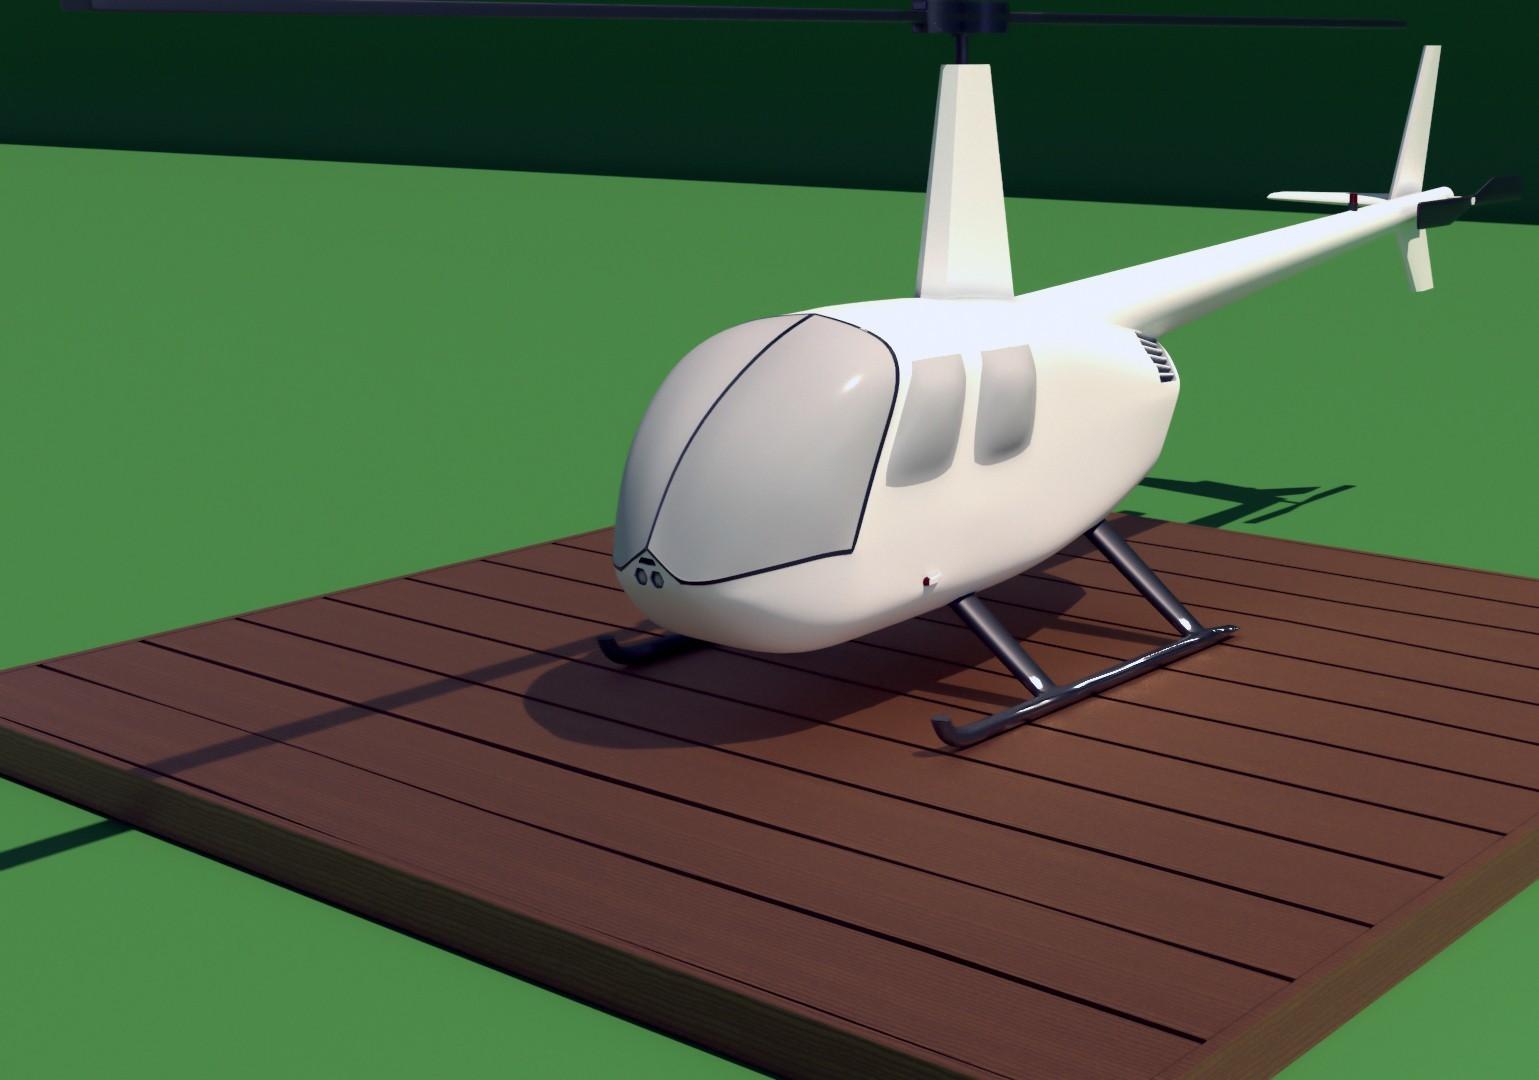 R44_1.jpg Download STL file Robinson Raven R44 3D print model • 3D printer model, Eduardohbm